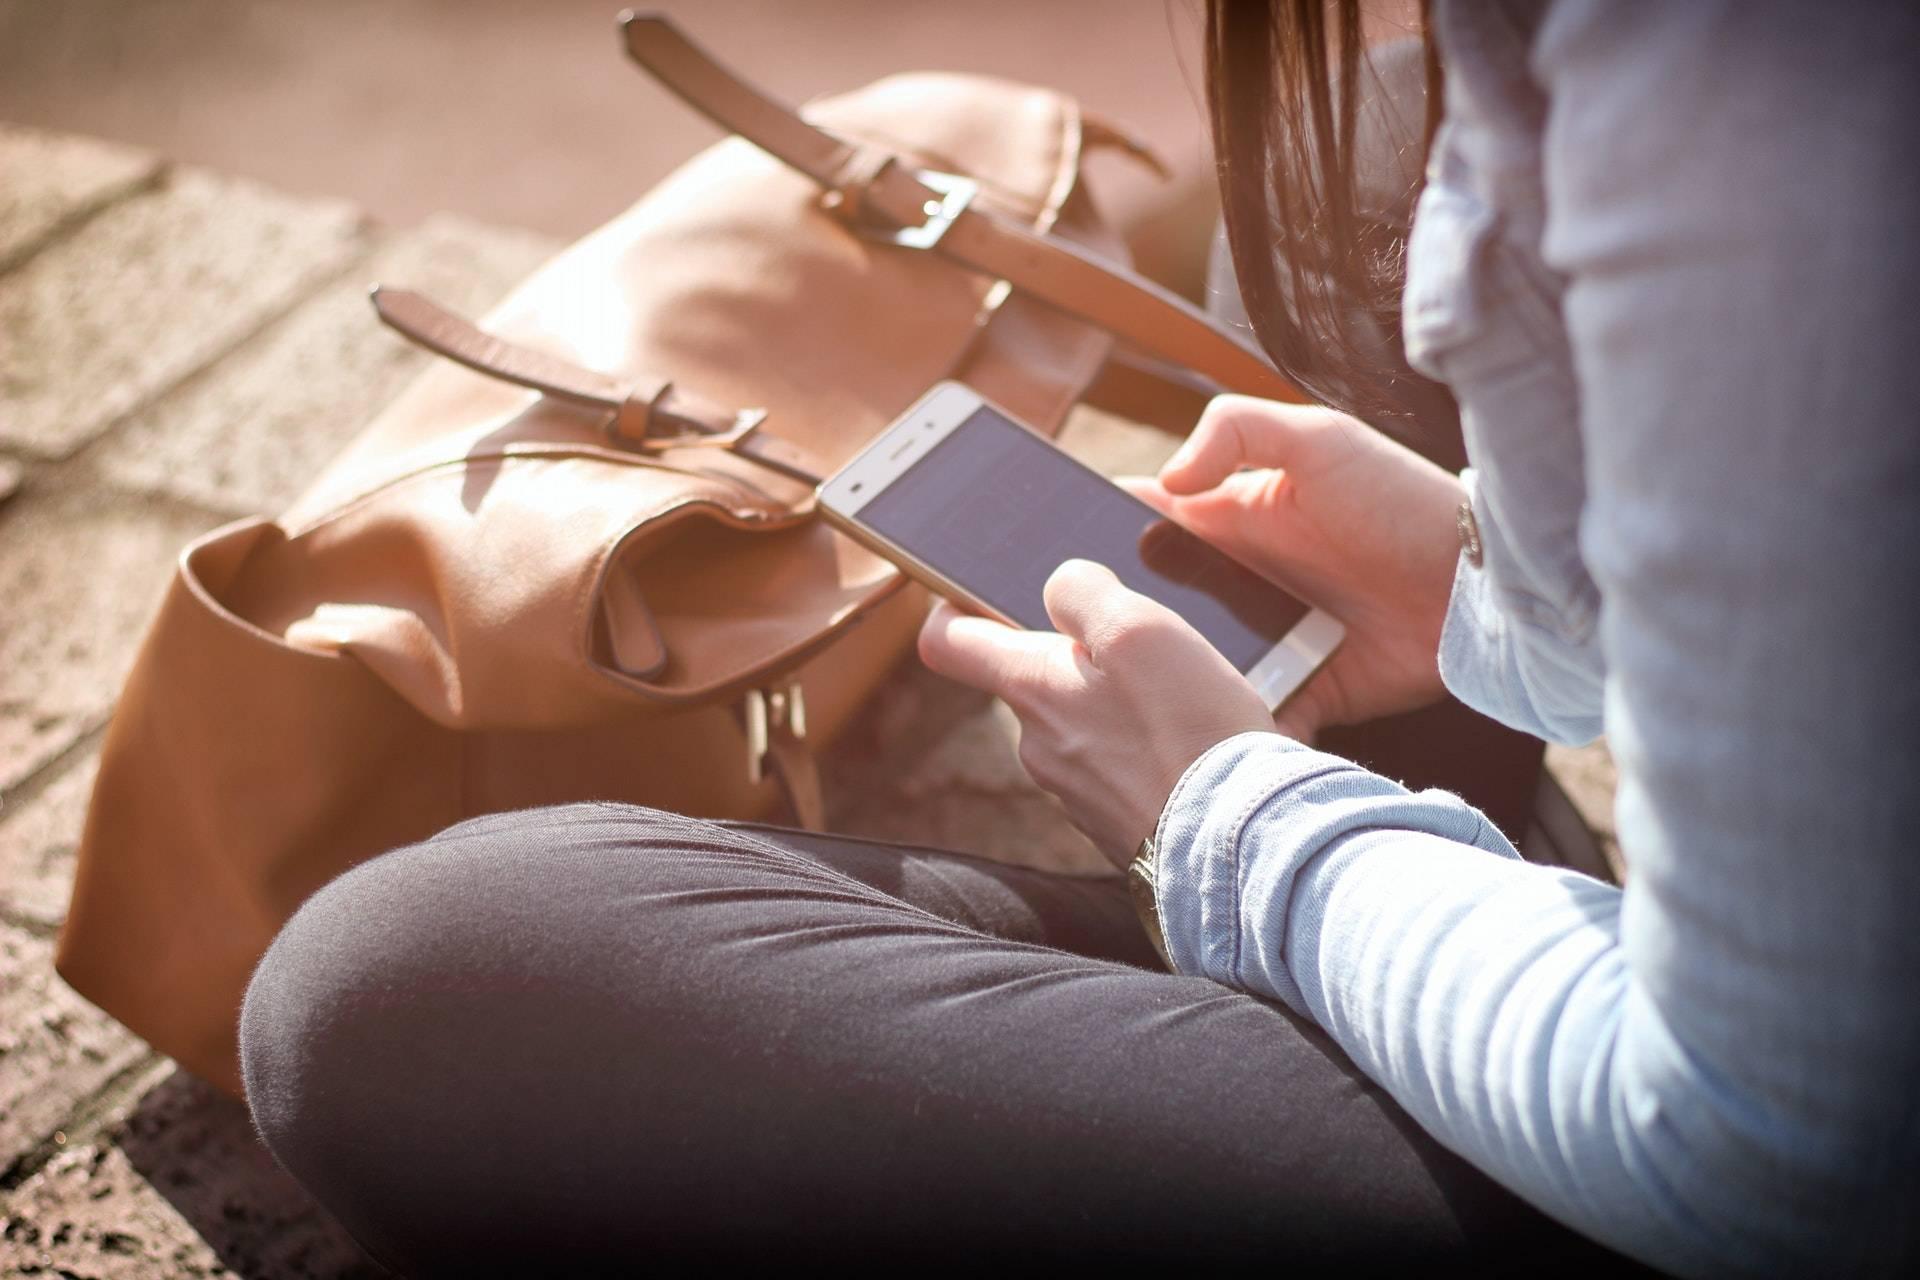 Woman using app for PAX 3 vaporizer